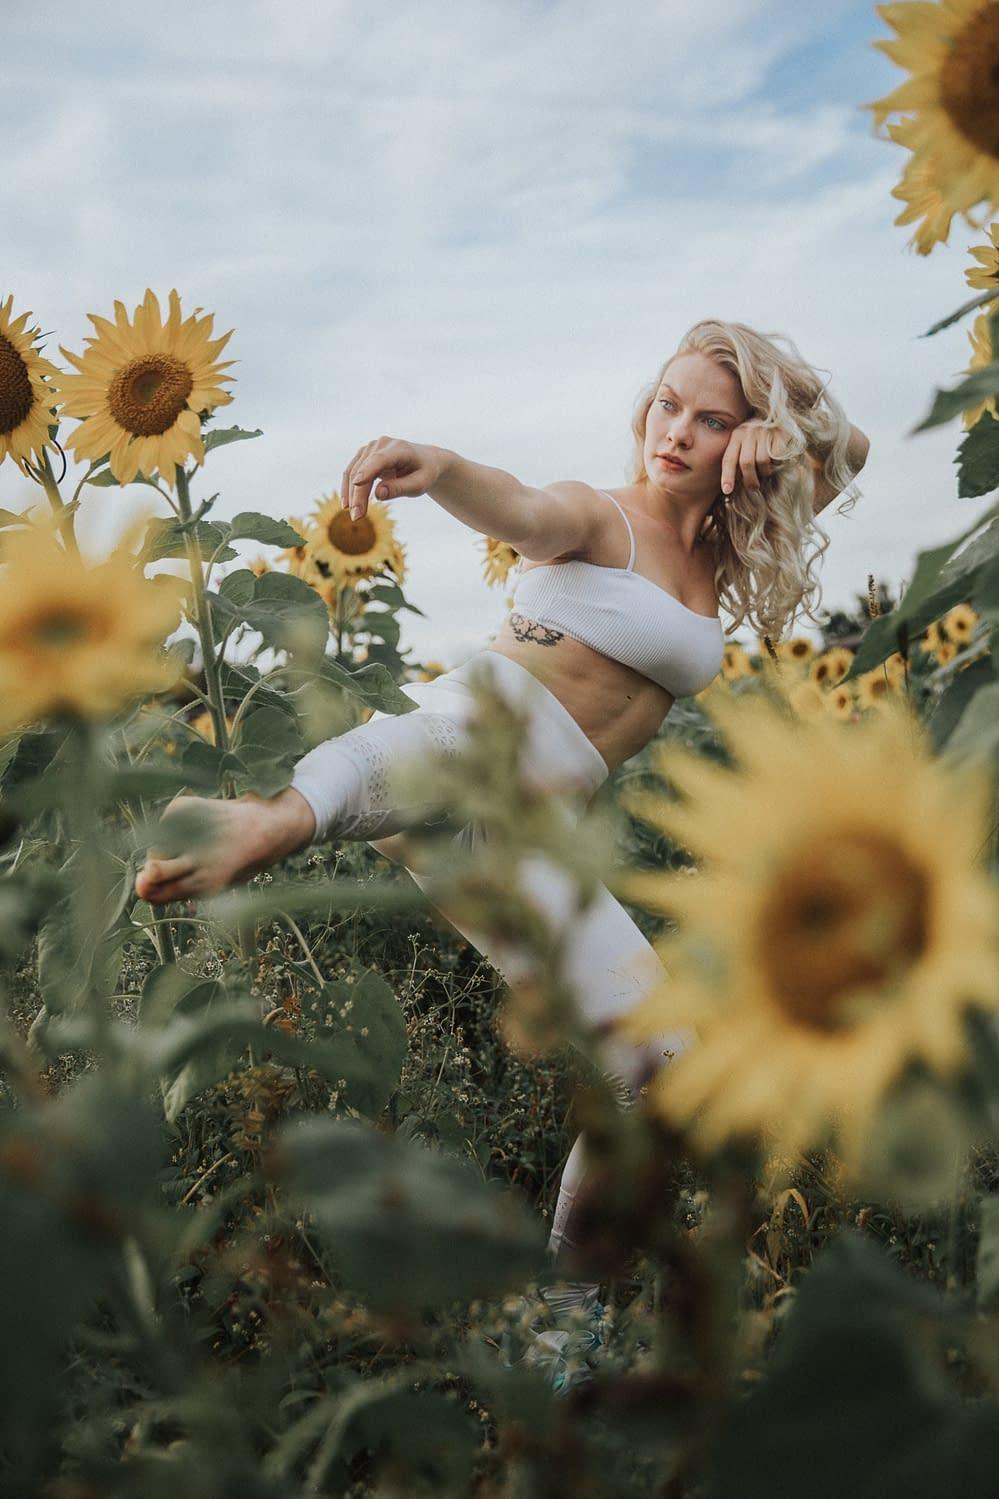 Natur Portrait - Fotoshooting im Sonnenblumenfeld